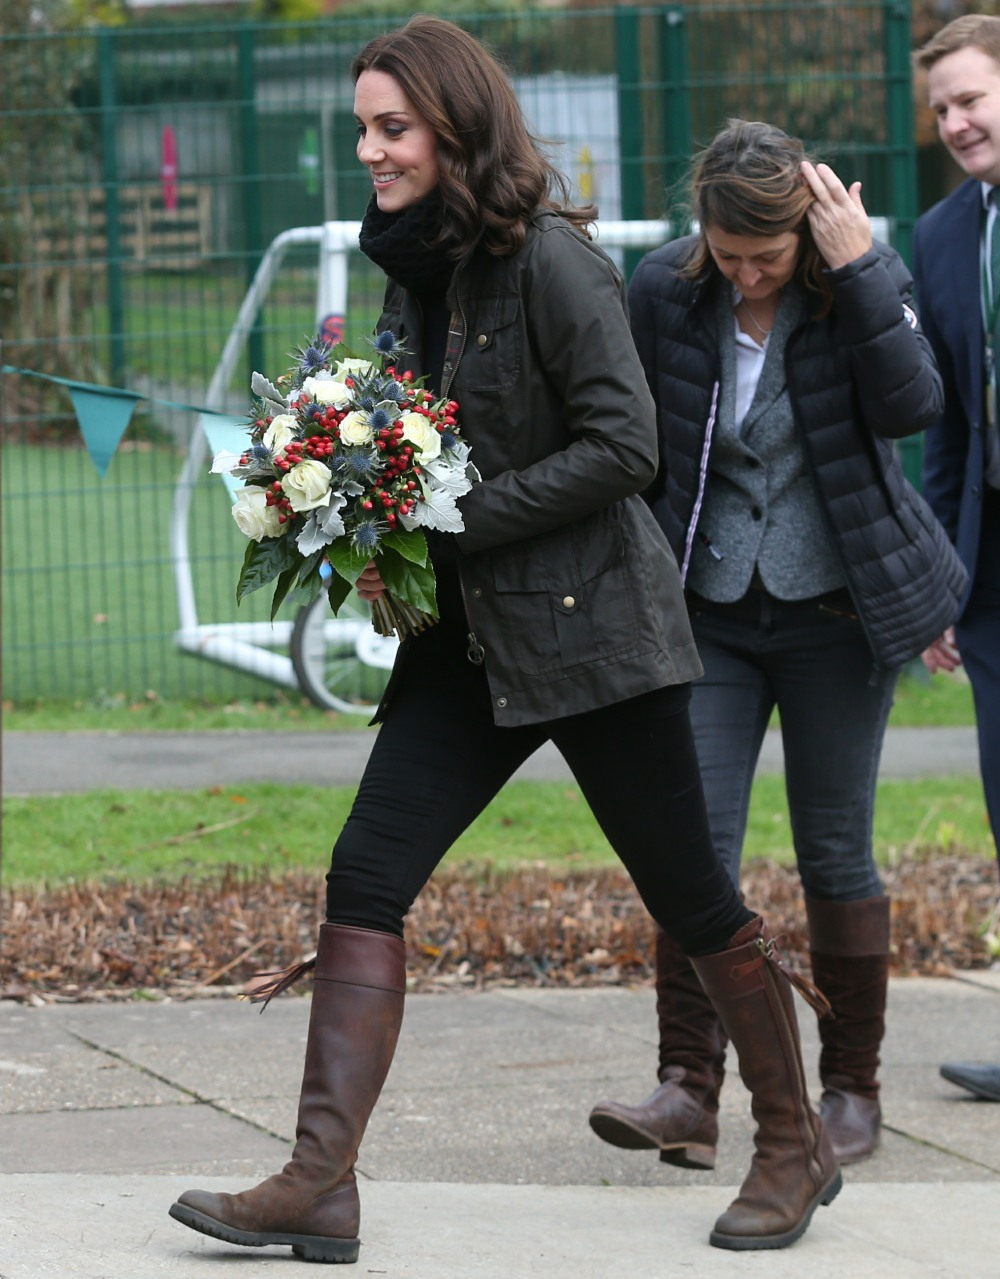 The Duchess of Cambridge visits Robin Hood Primary School